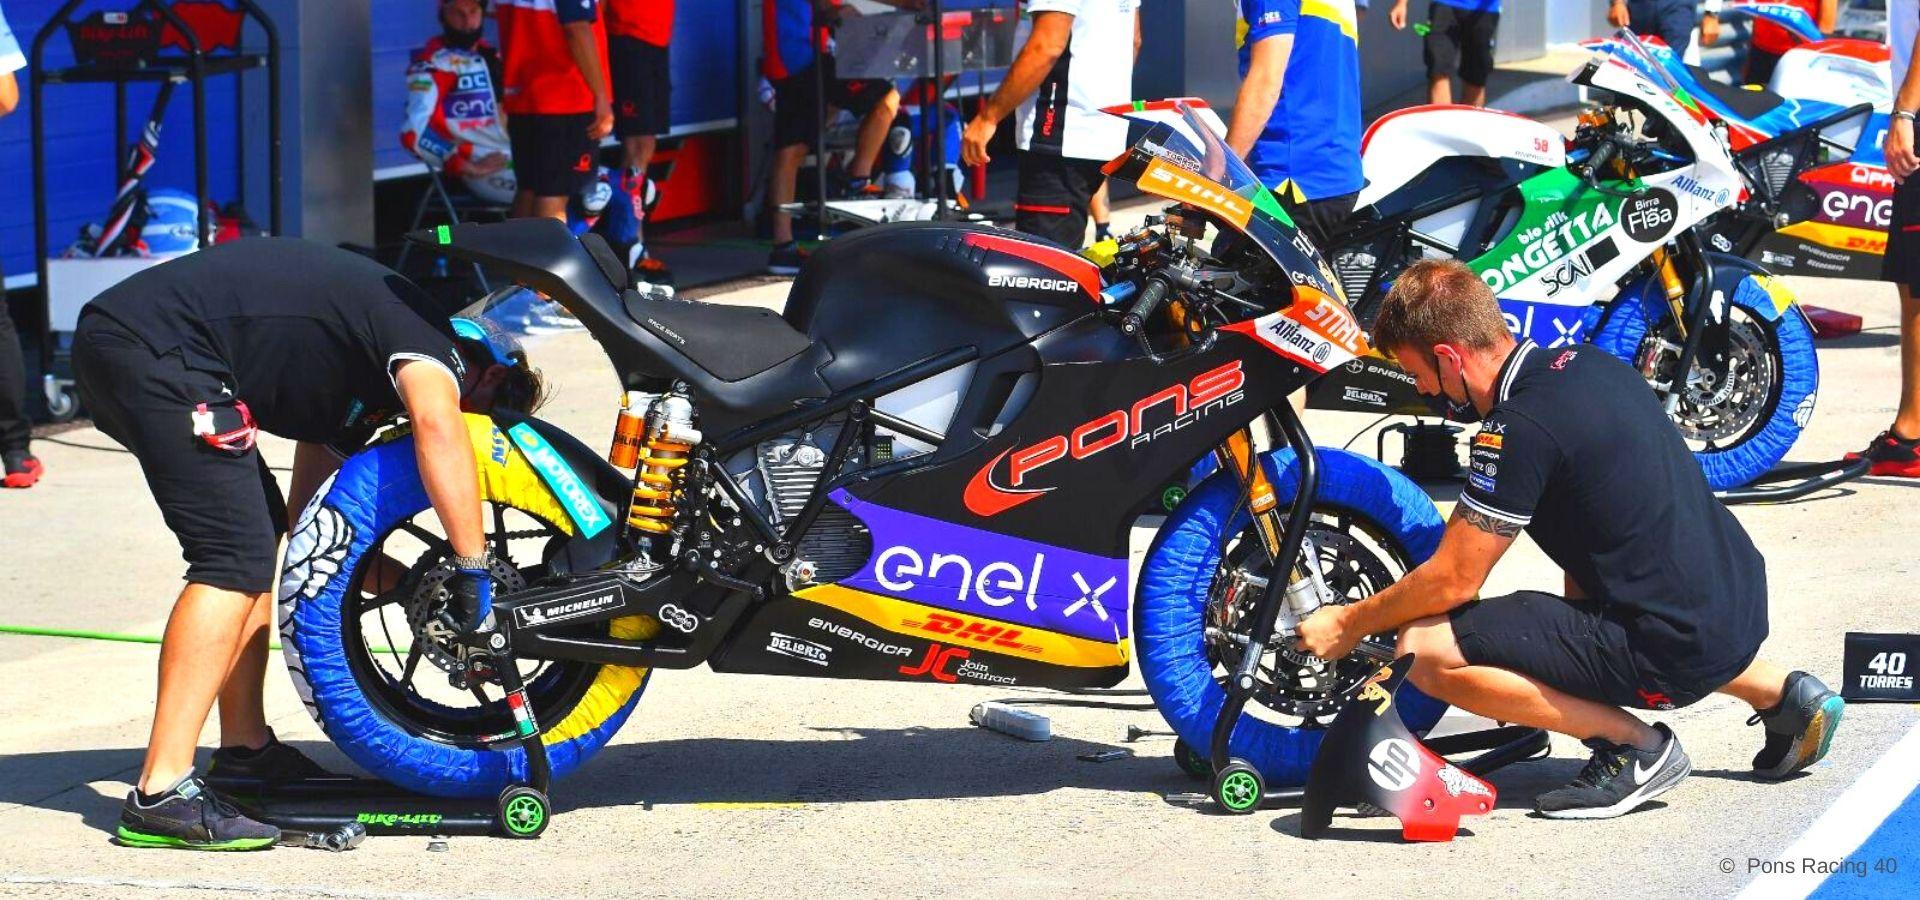 Pons Racing 40 e Jasper Iwema insieme nella MotoE 2021